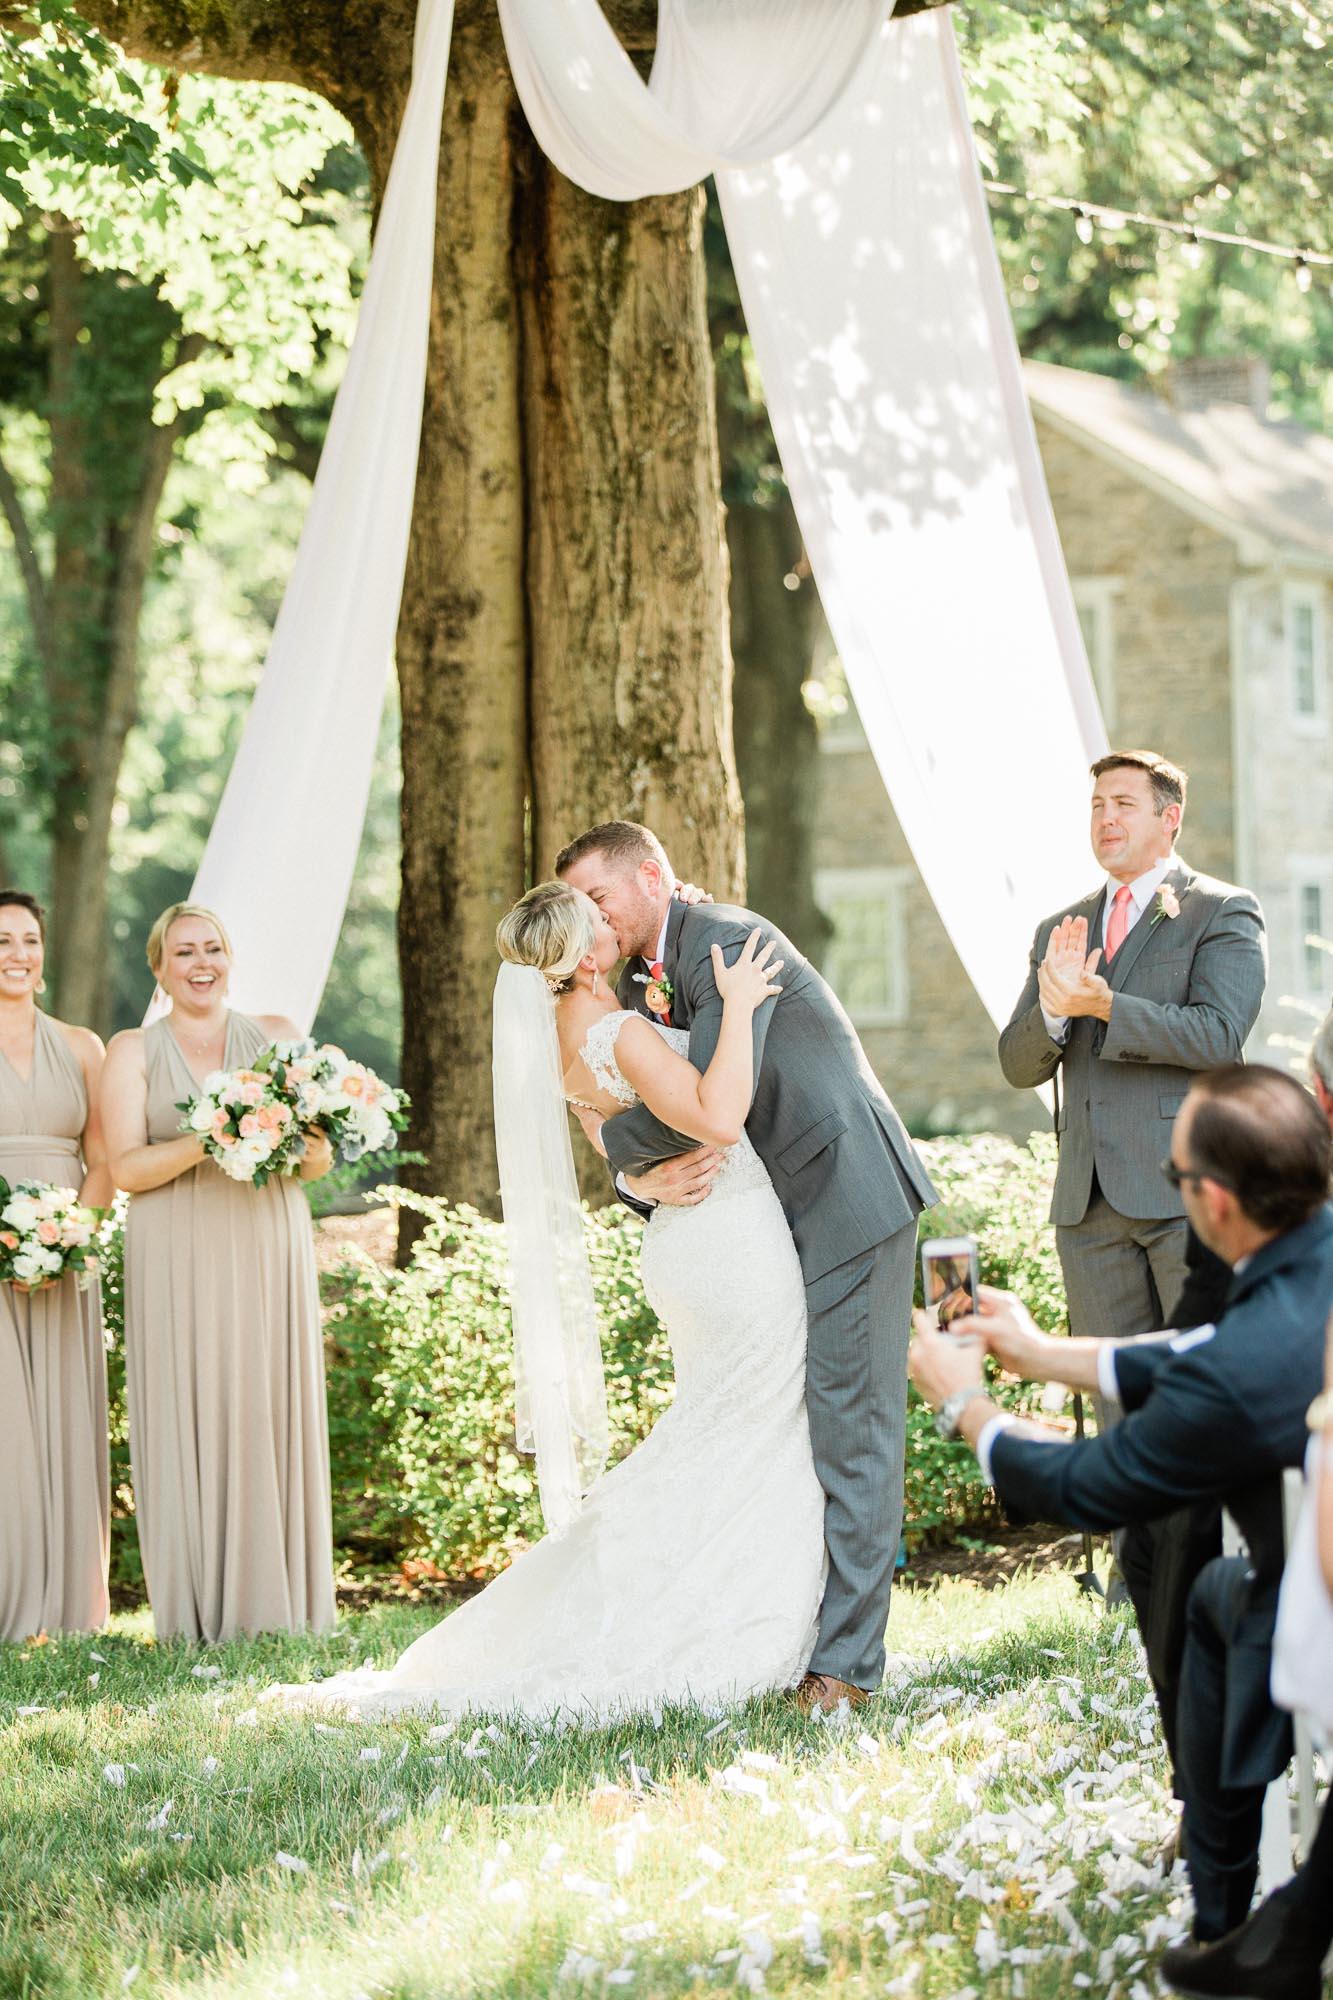 Allenberry-resort-historic-pennsylvania-wedding-22154.jpg